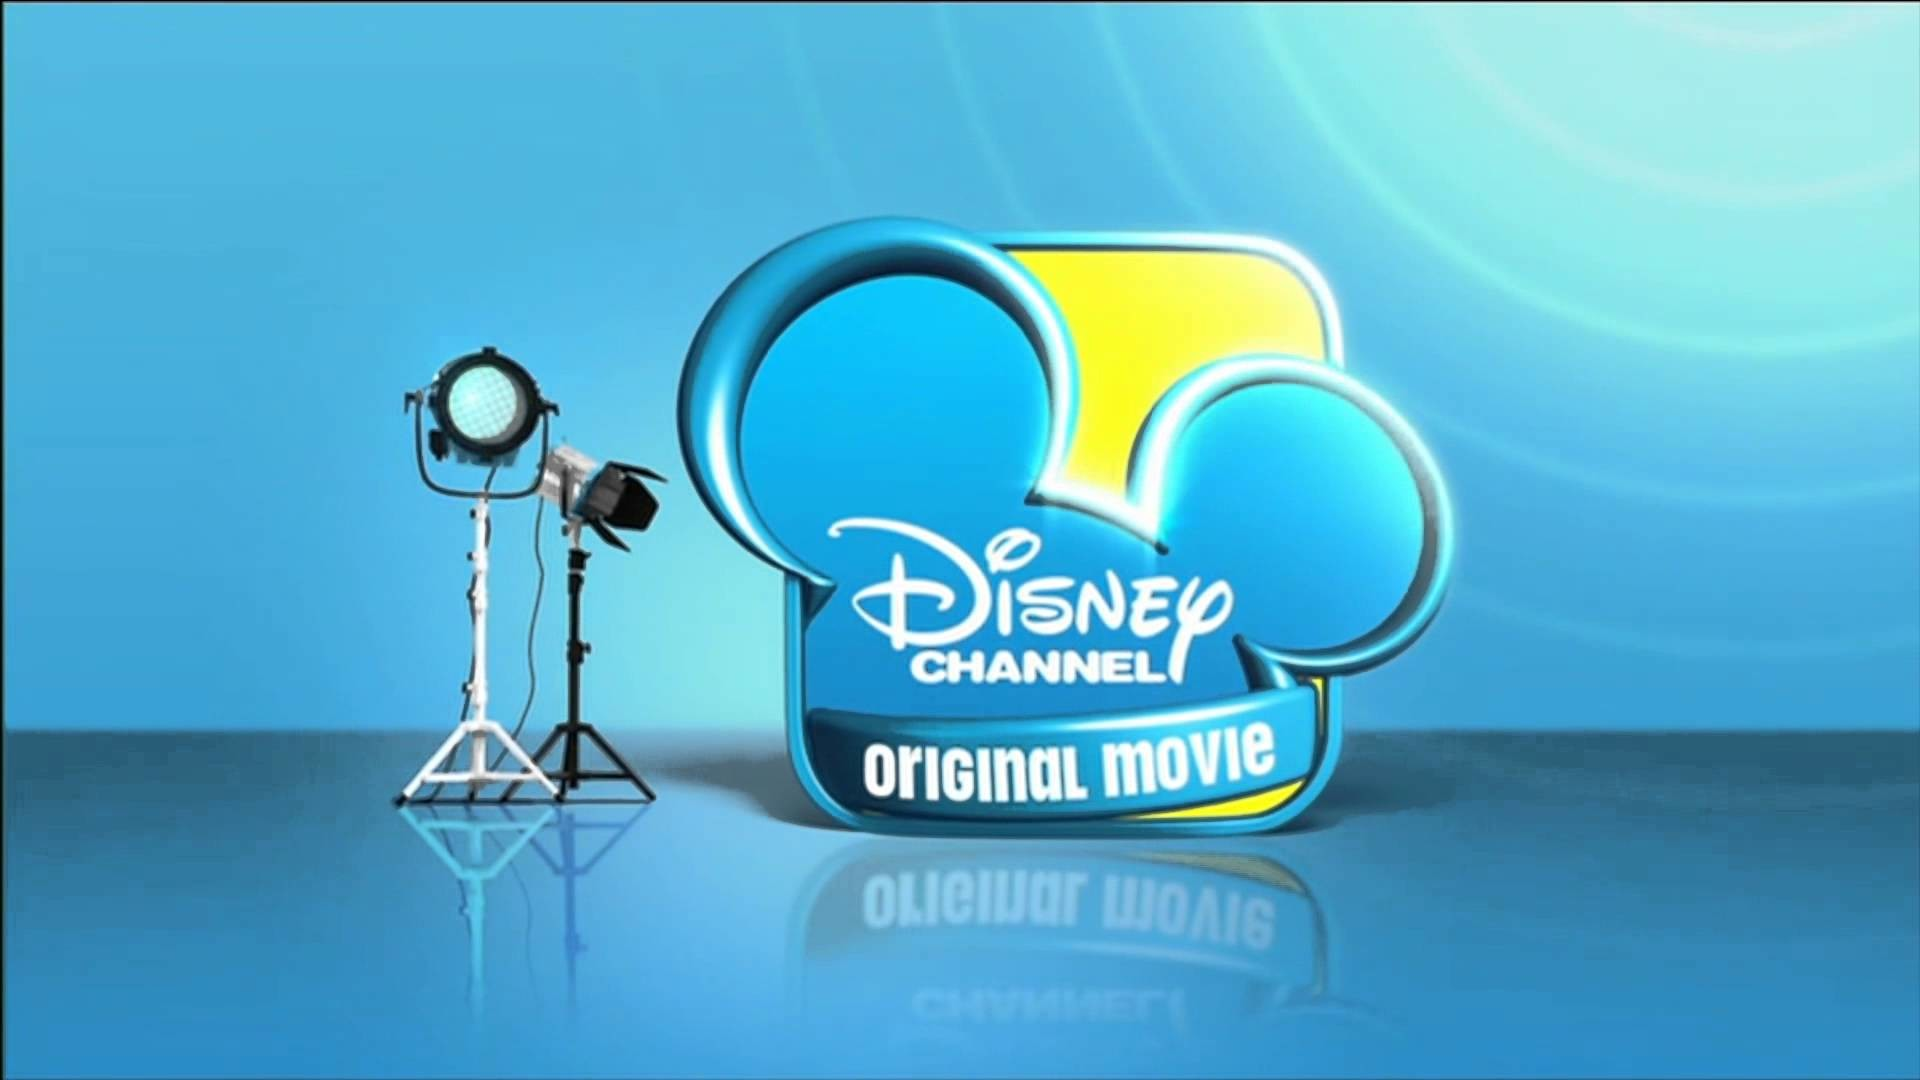 Disney Channel Wallpaper 63 Images